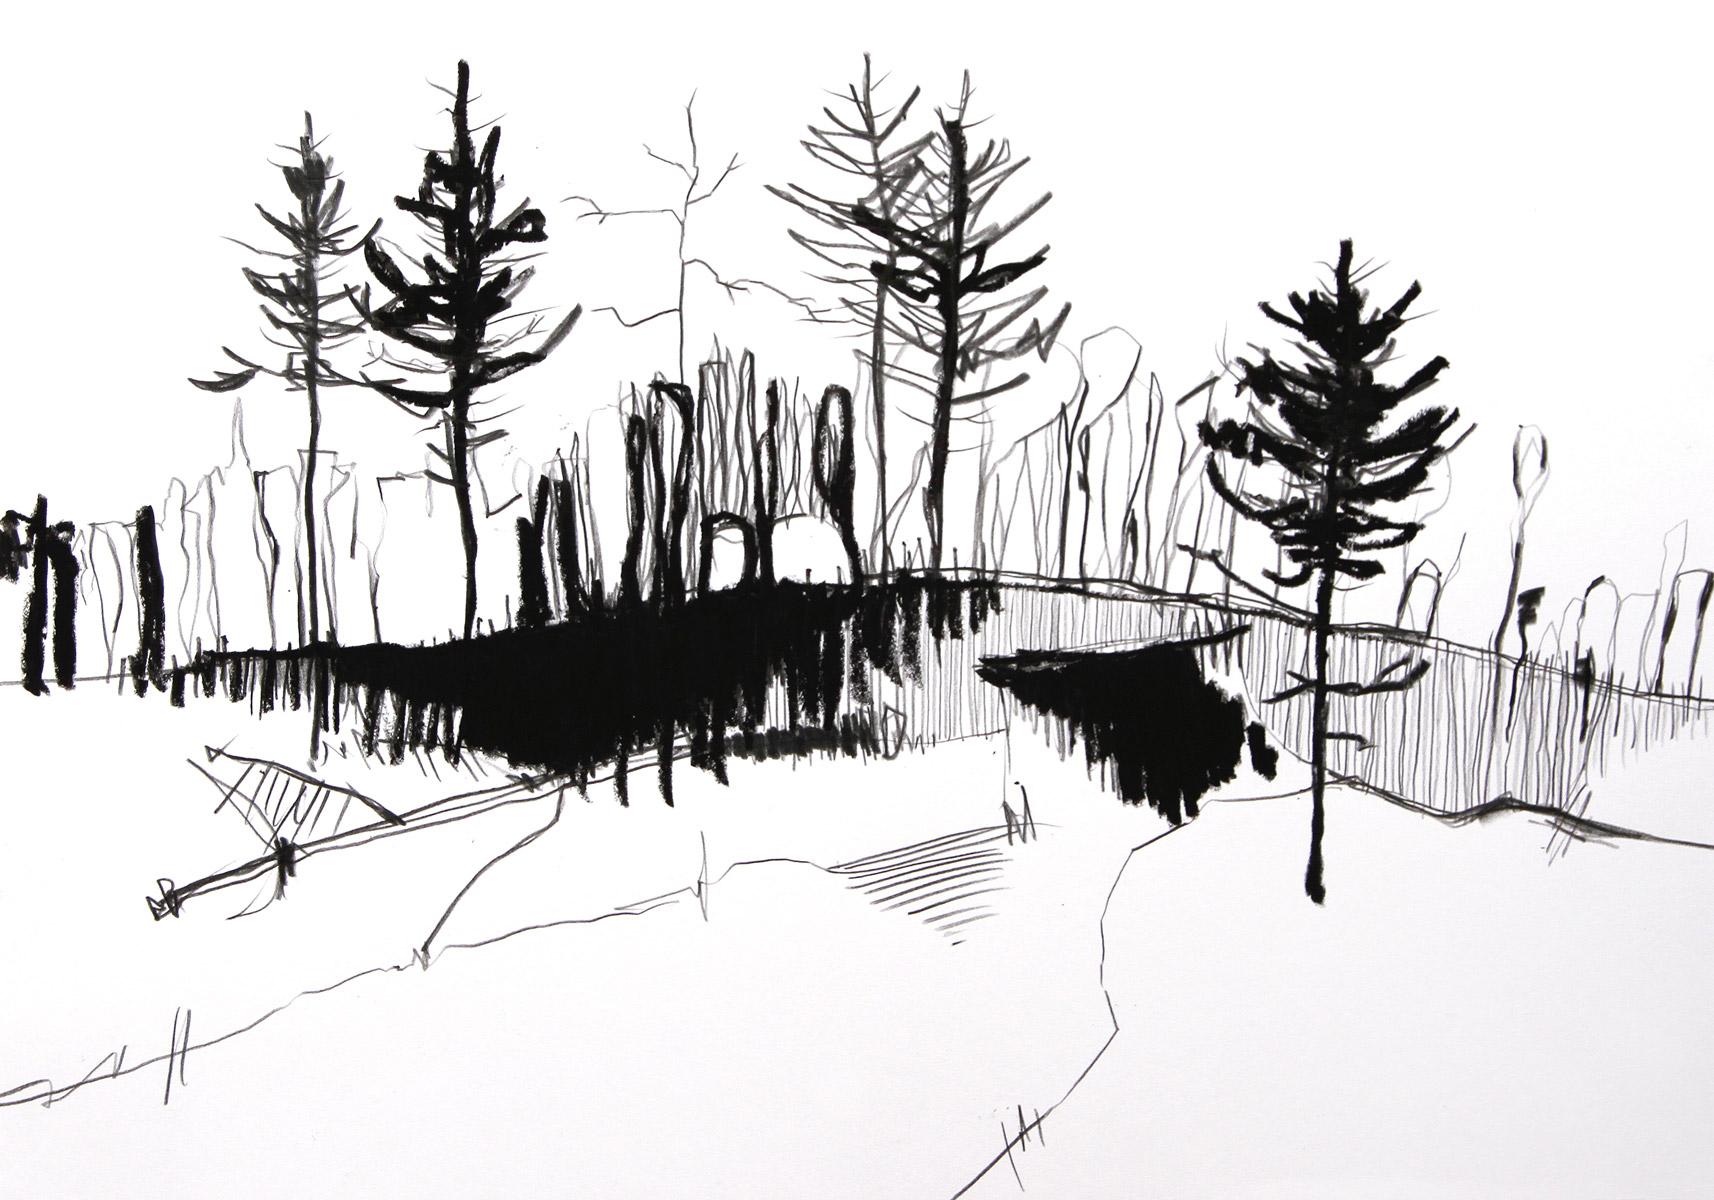 Finsterwald, 2020, 42cm x 29,7 cm